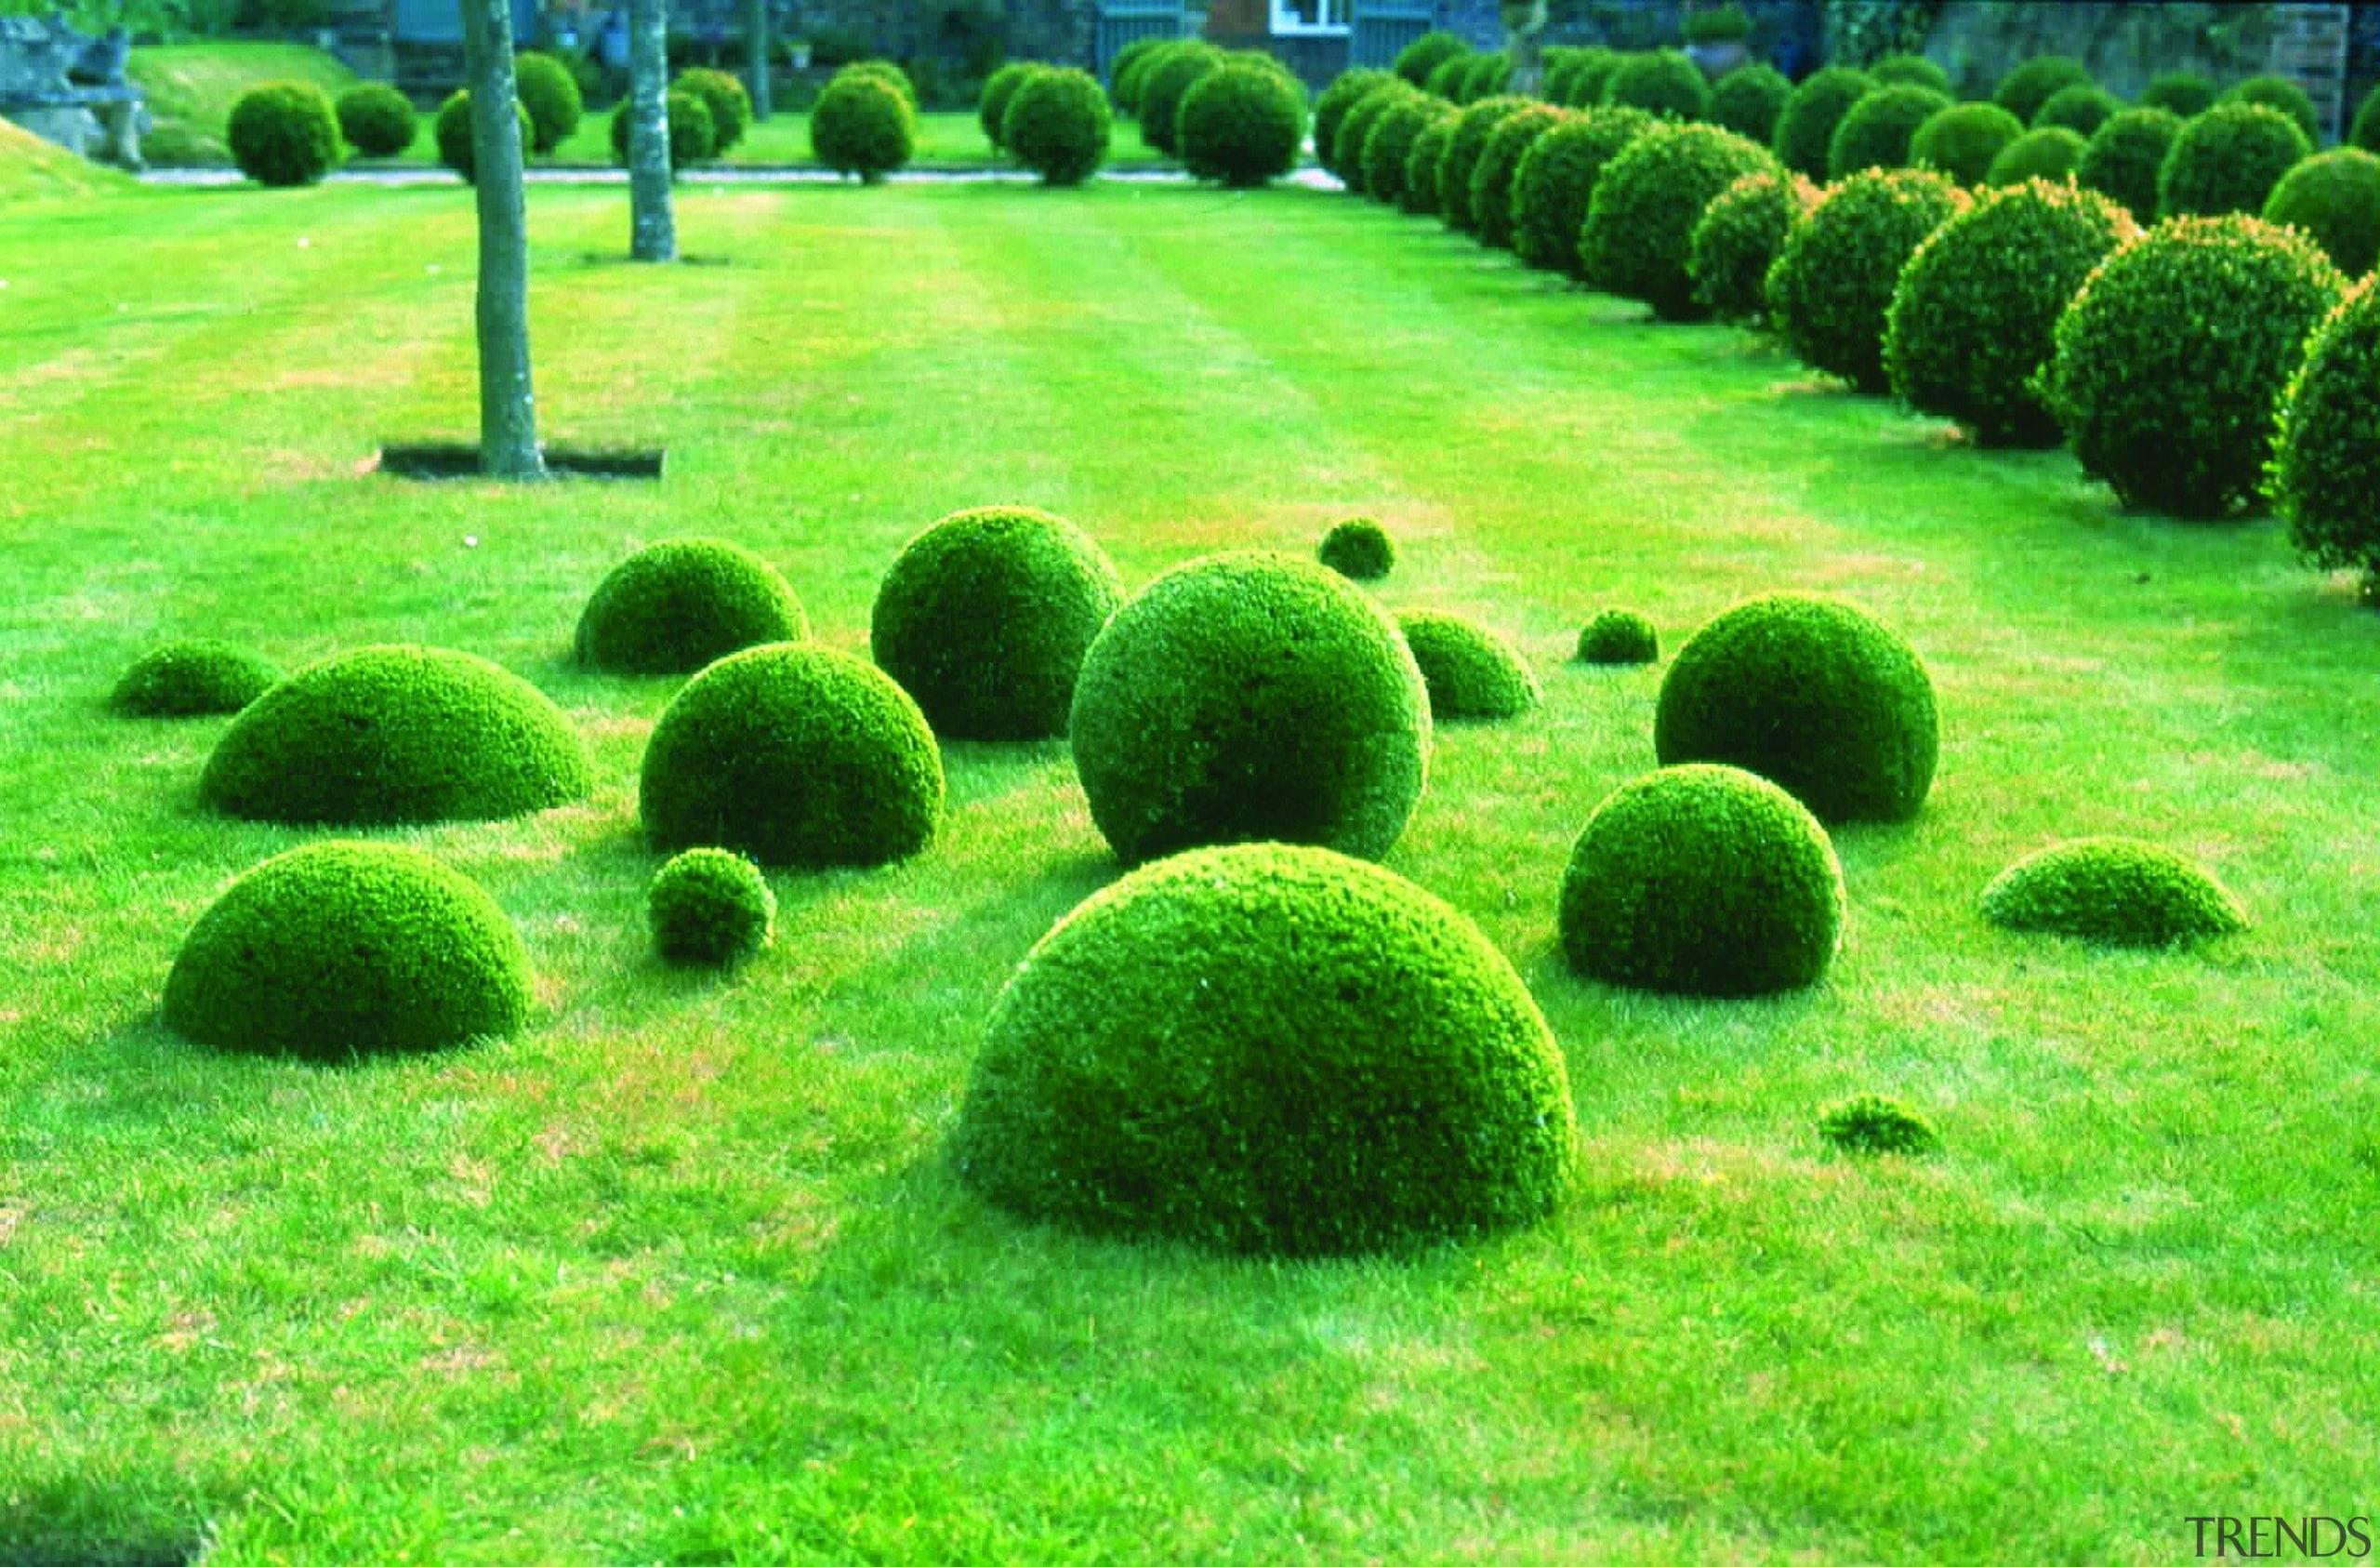 Commercial landscape - biome | garden | grass biome, garden, grass, grass family, landscape, lawn, plant, shrub, tree, vegetation, green